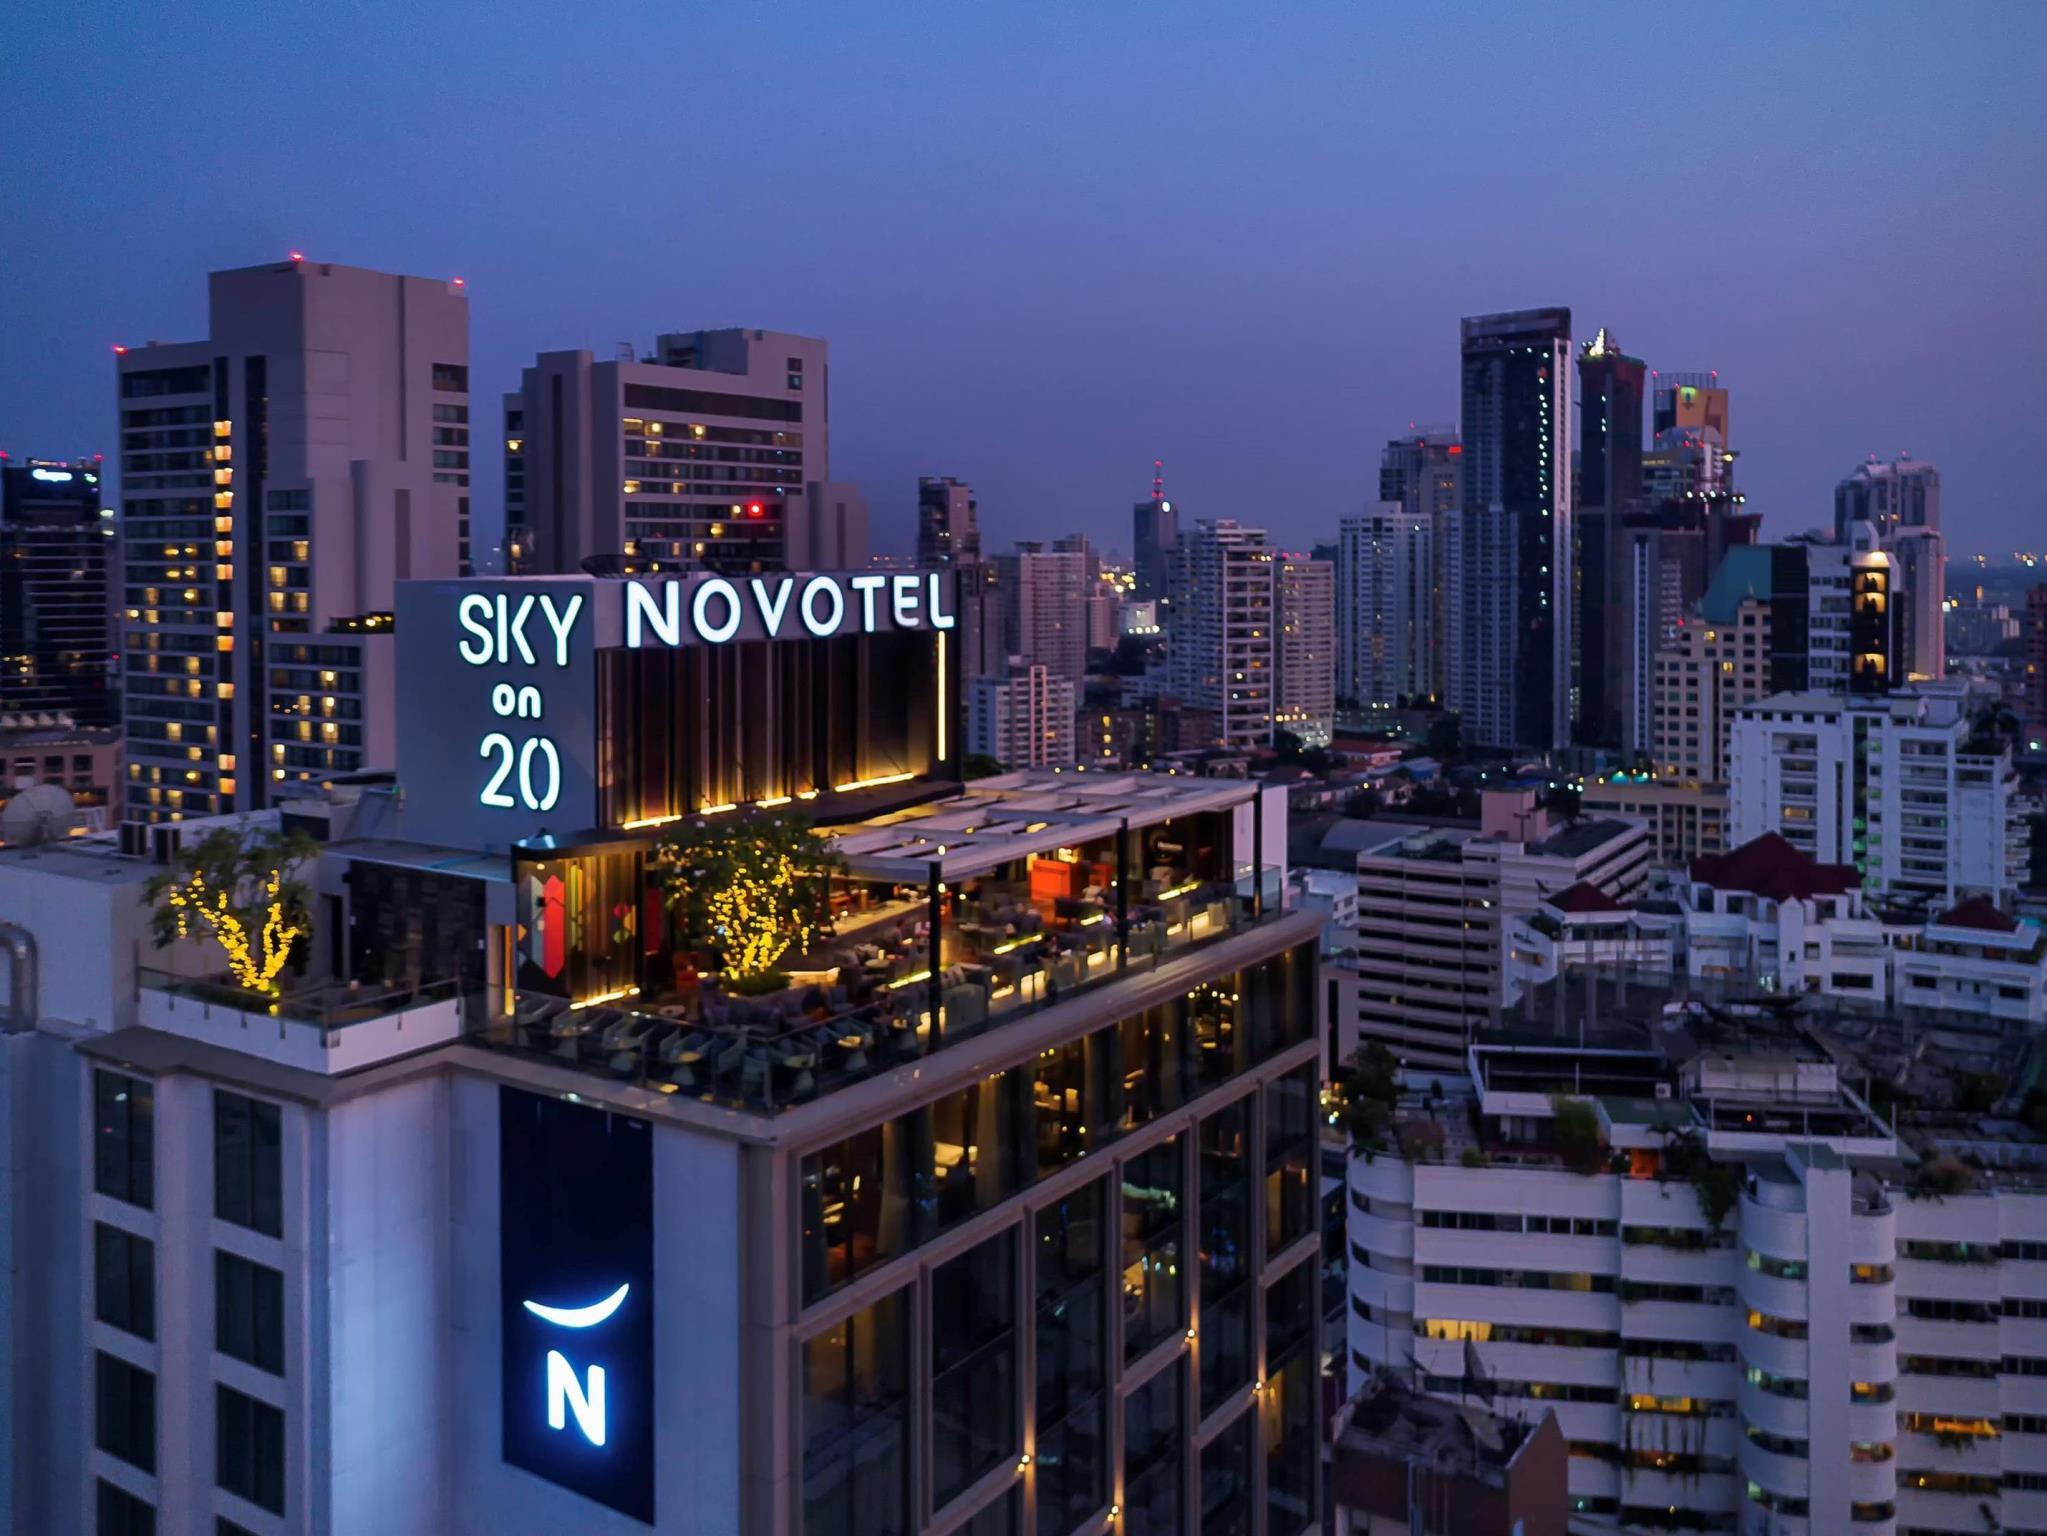 Novotel Bangkok Sukhumvit 20 - Bangkok